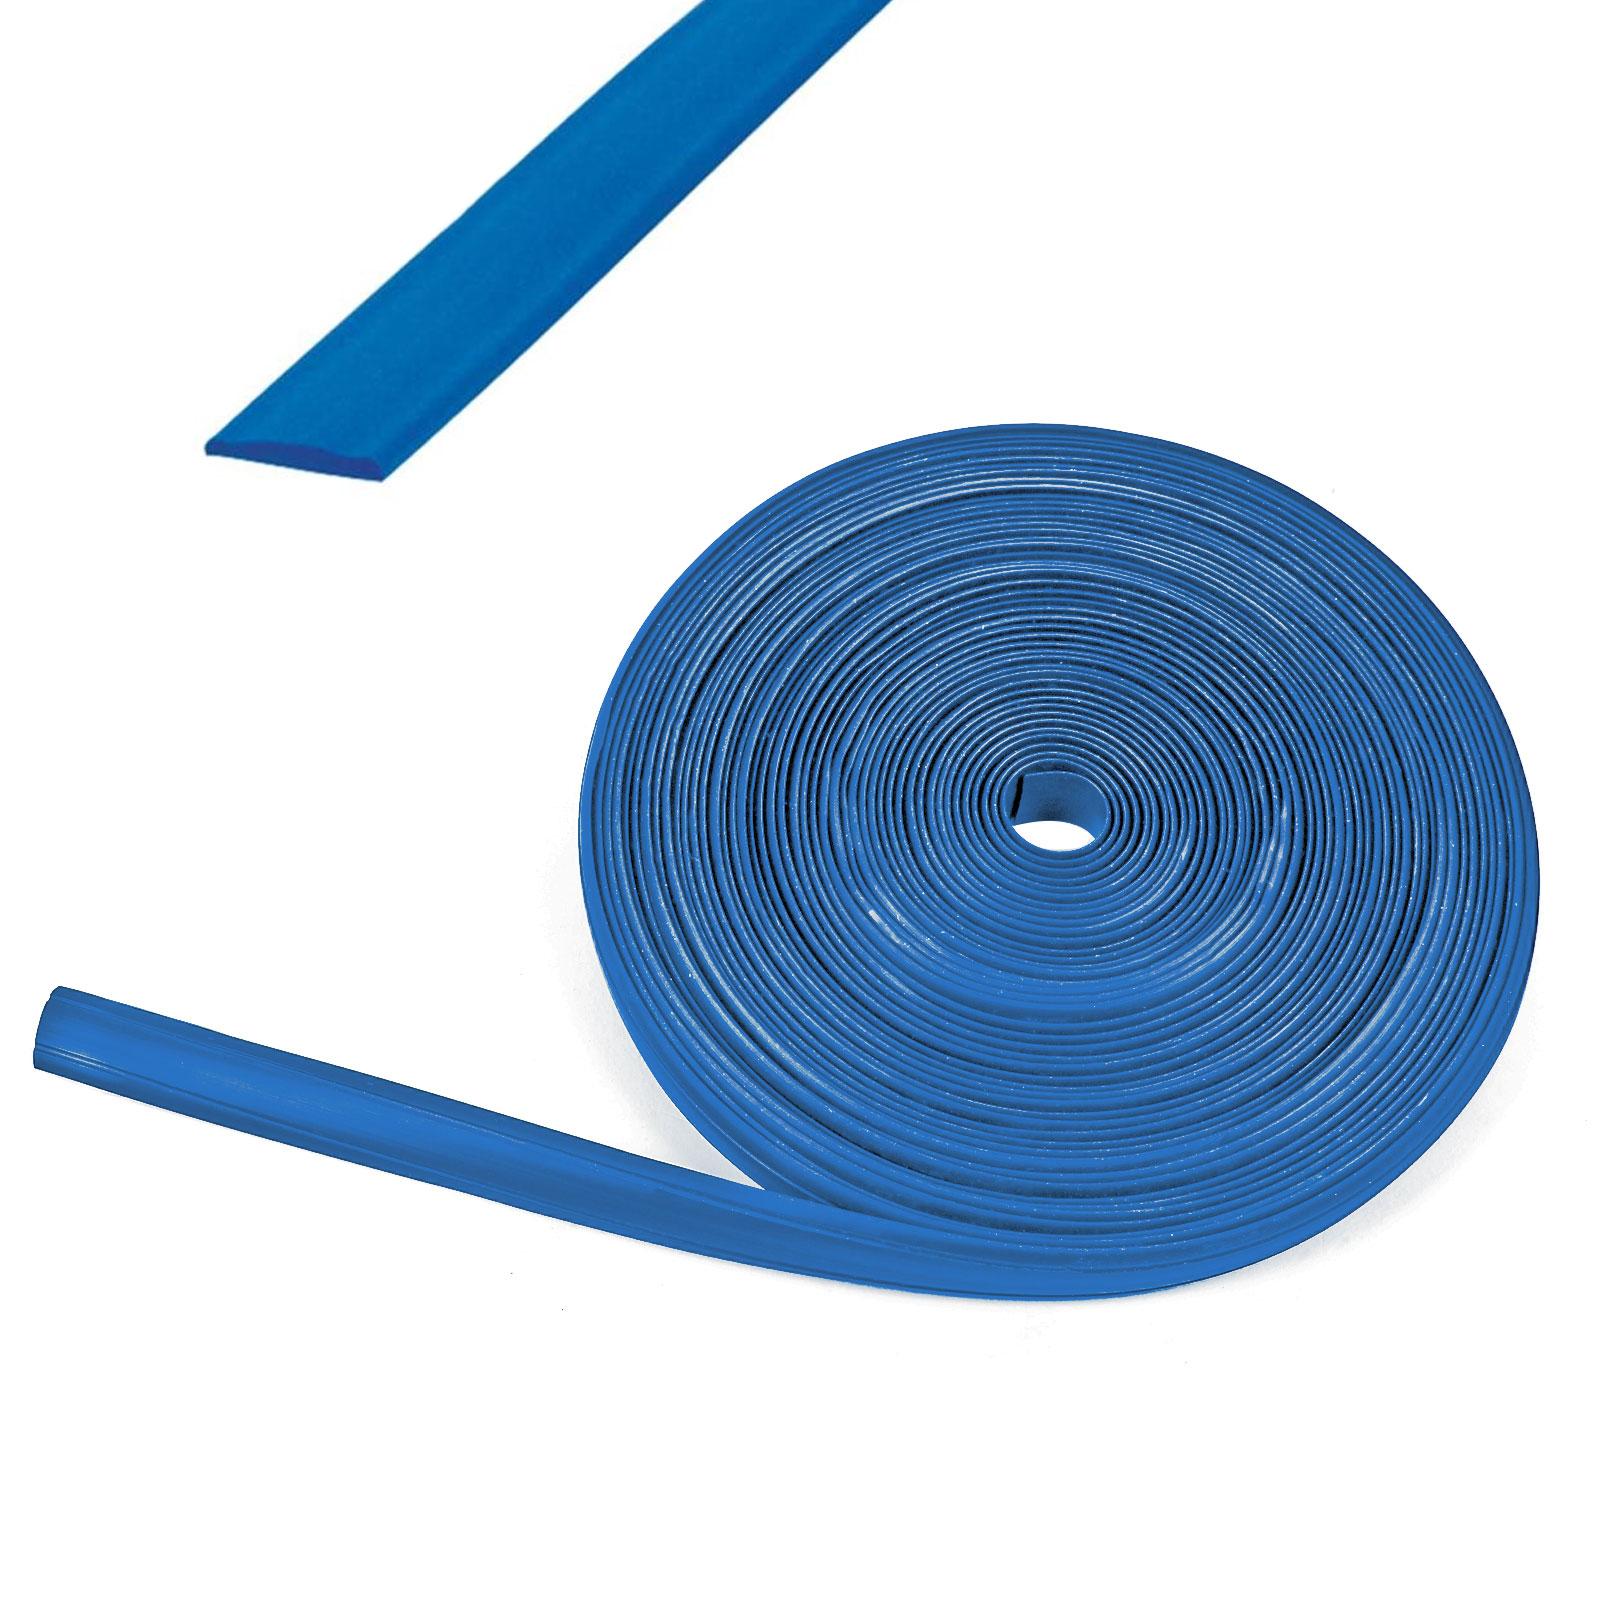 60 Meter Kederband 12 mm blau Kunststoff Leistenfüller